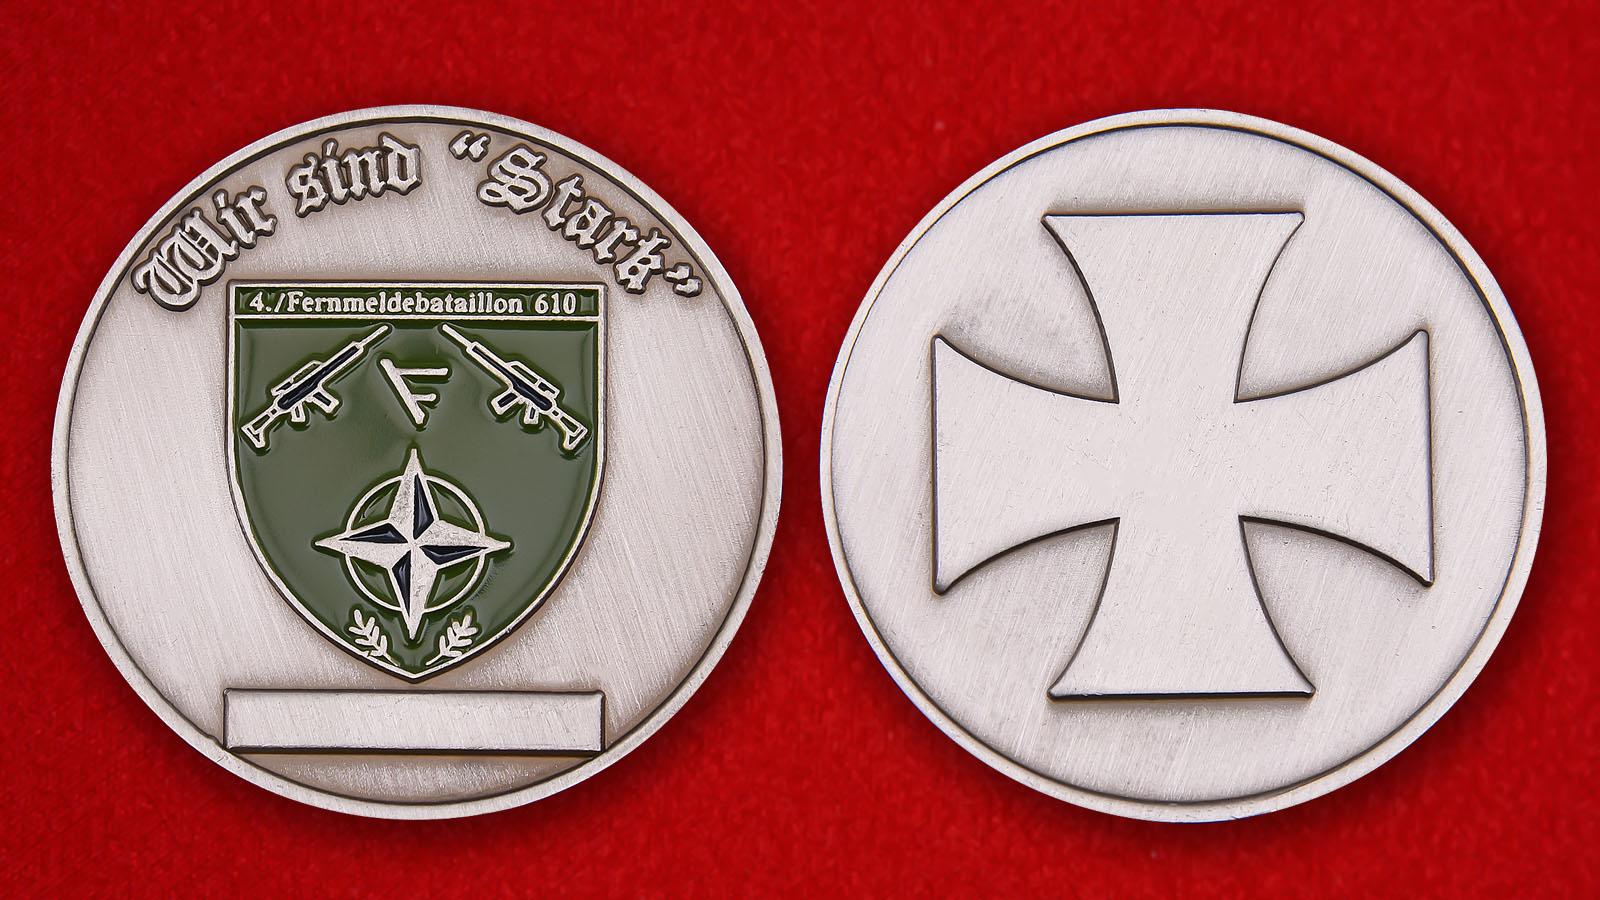 Челлендж коин 610-го батальона связиБундесвера - аверс и реверс